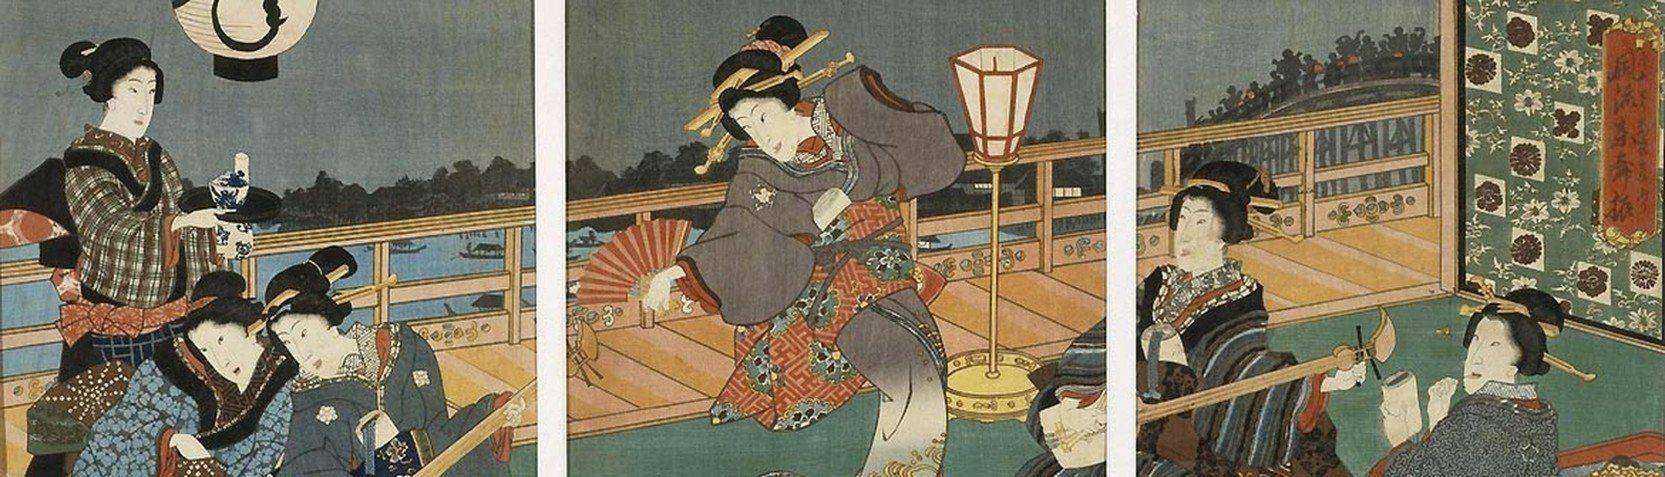 Artists - Utagawa Kunisada